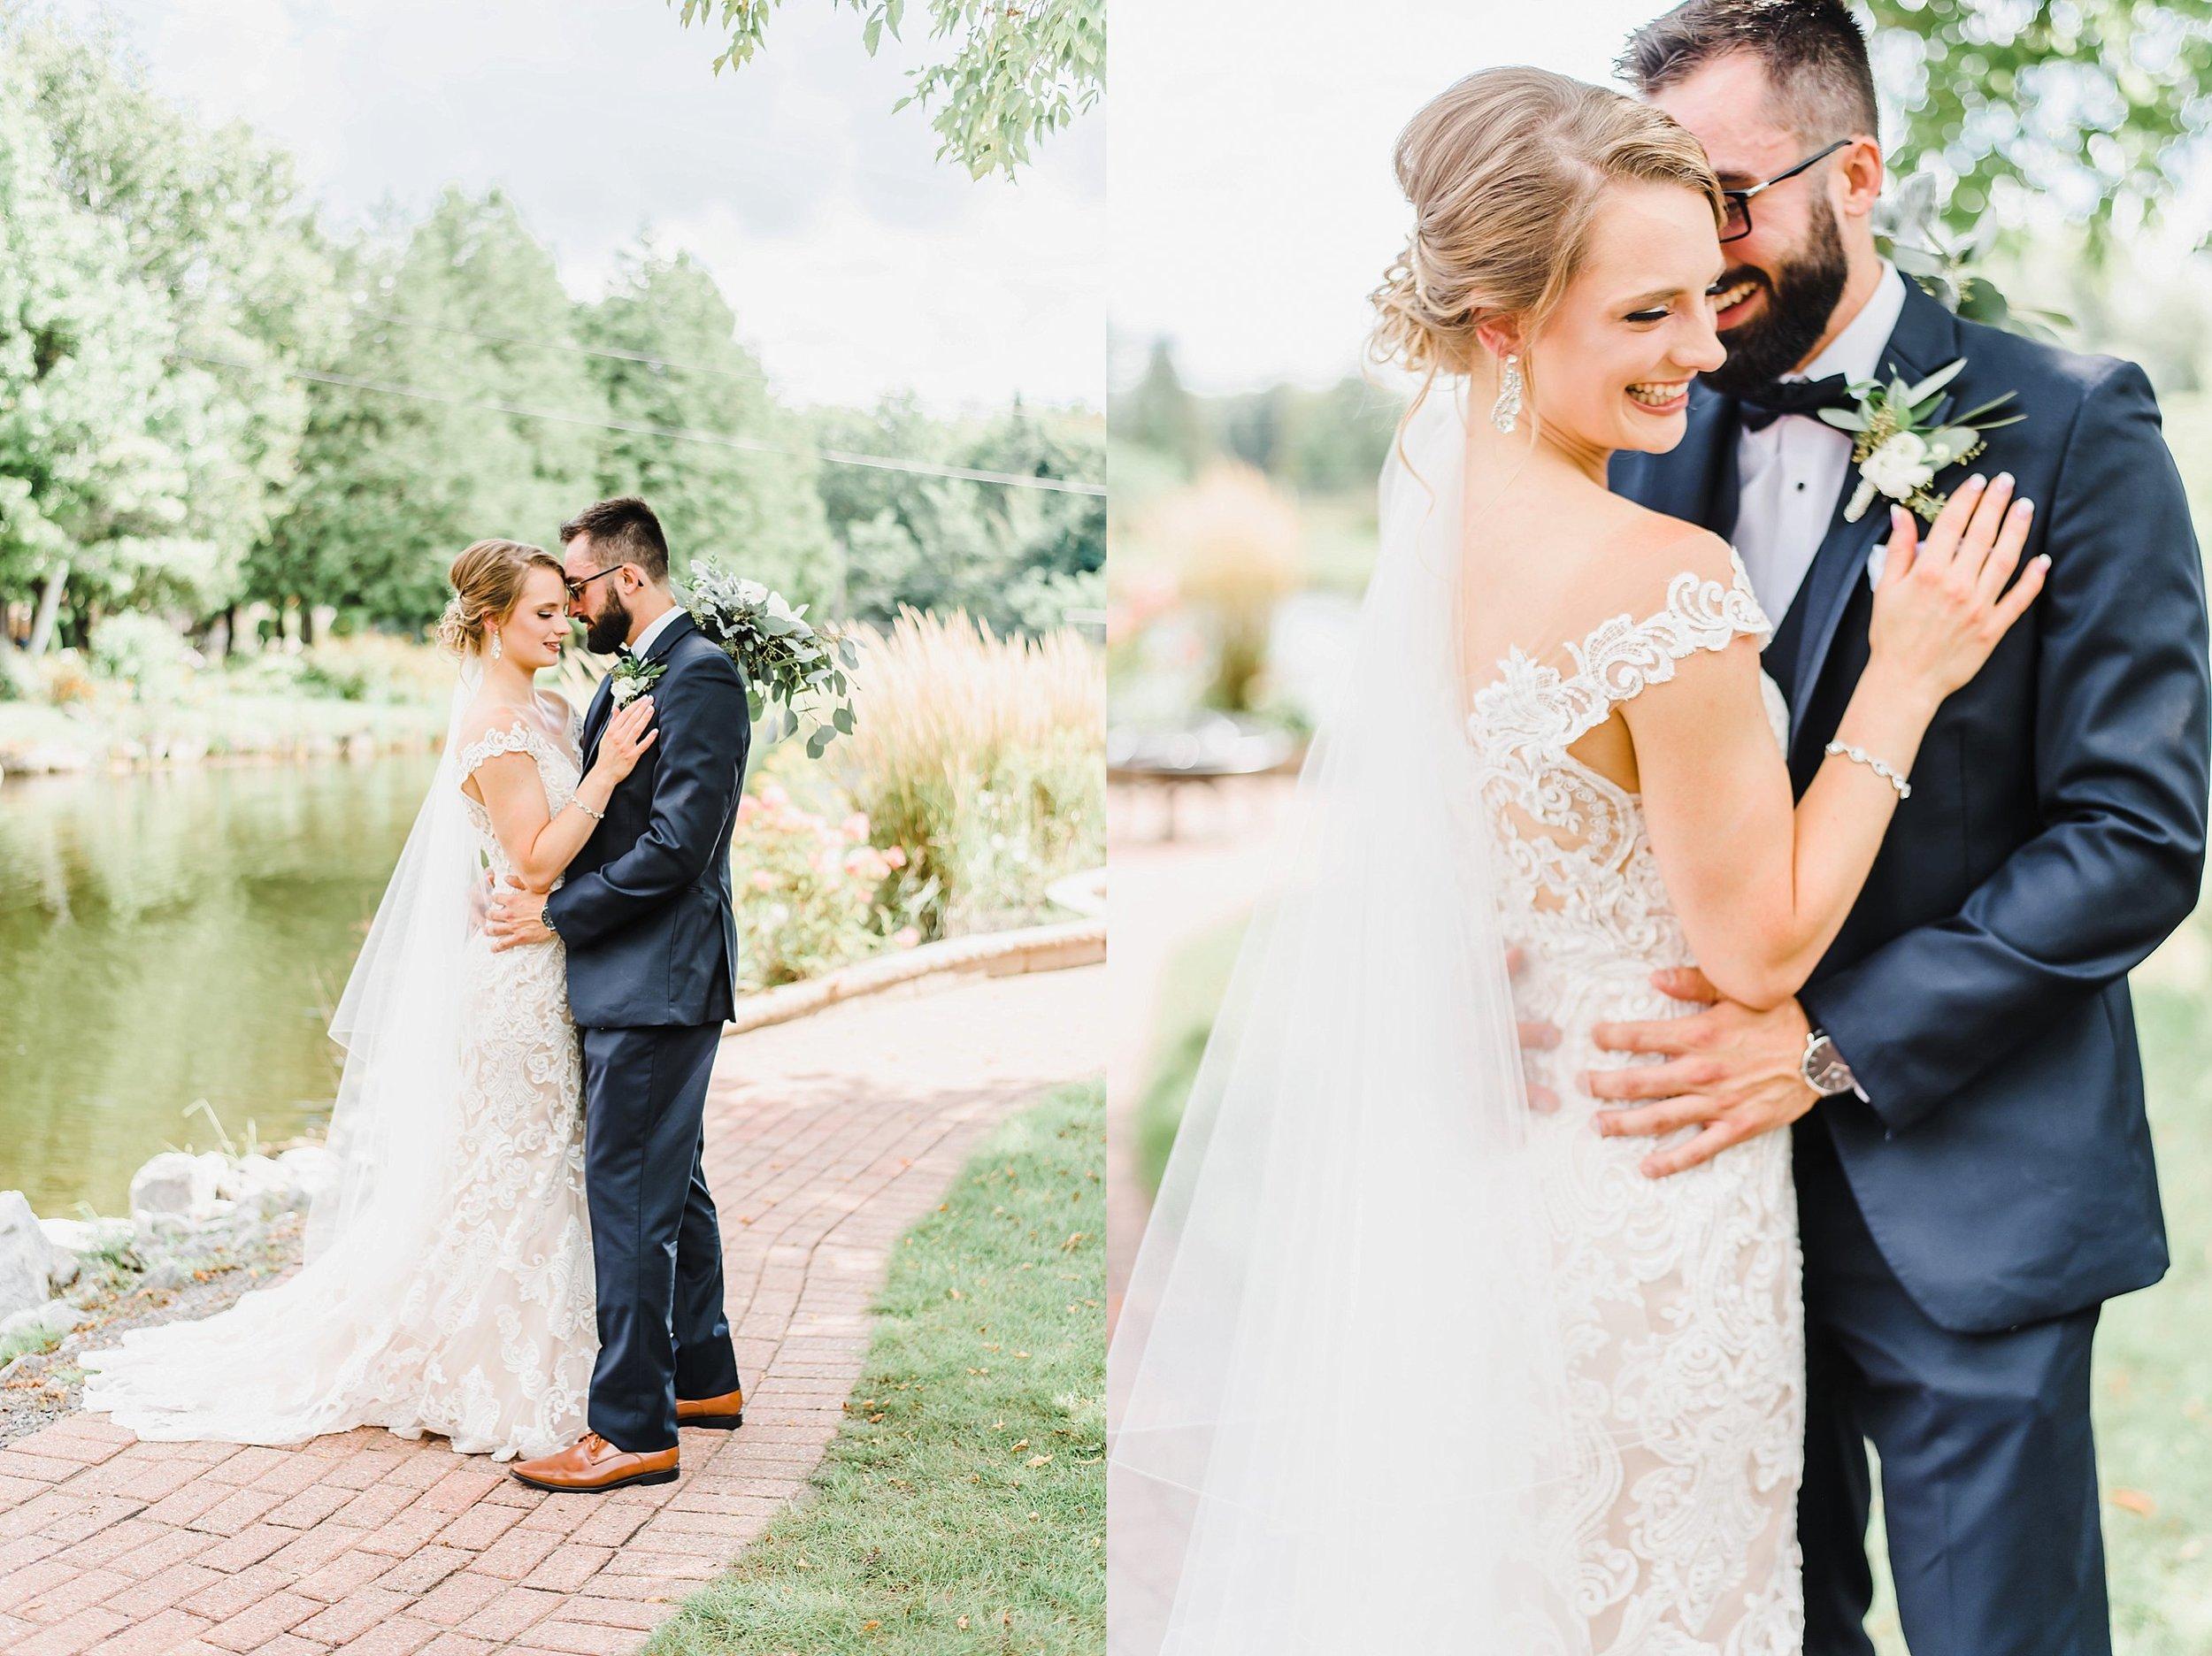 light airy indie fine art ottawa wedding photographer | Ali and Batoul Photography_1248.jpg